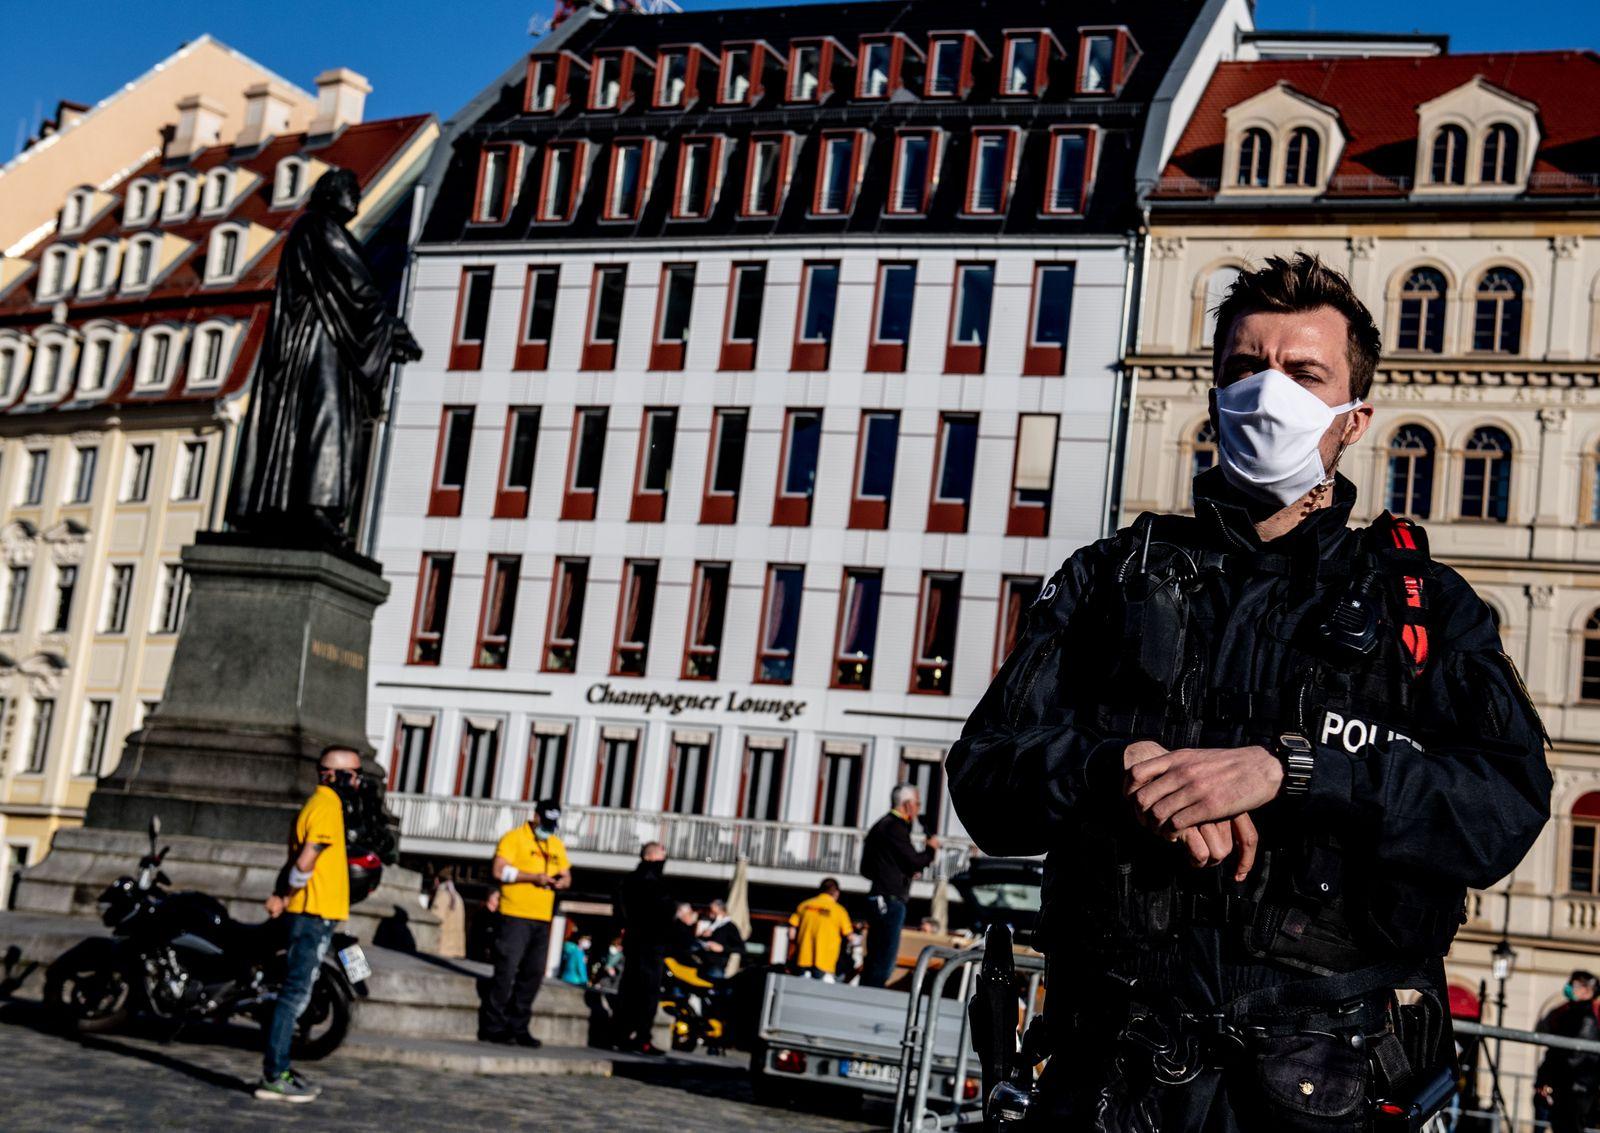 Protest of far-right, anti-Islam PEGIDA movement in Dresden, Germany - 20 Apr 2020